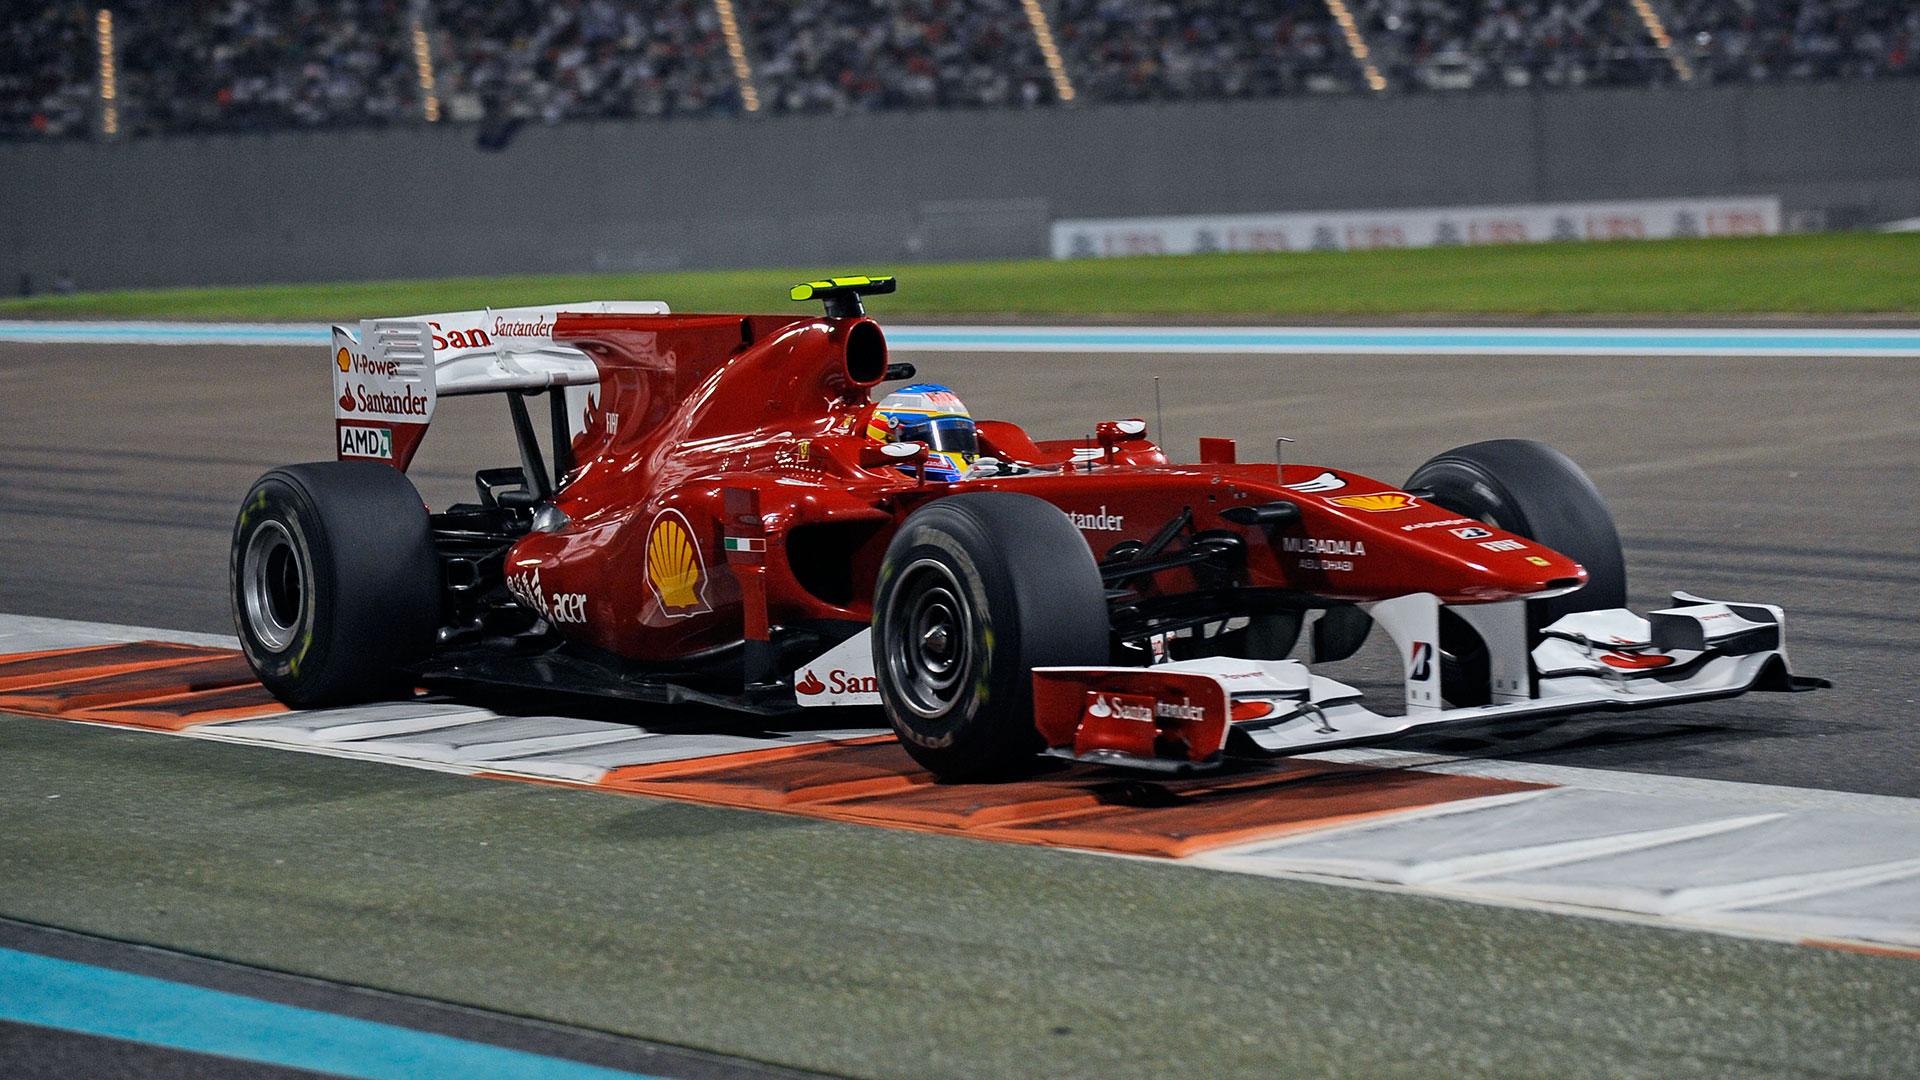 HD Wallpapers 2010 Formula 1 Grand Prix Of Abu Dhabi